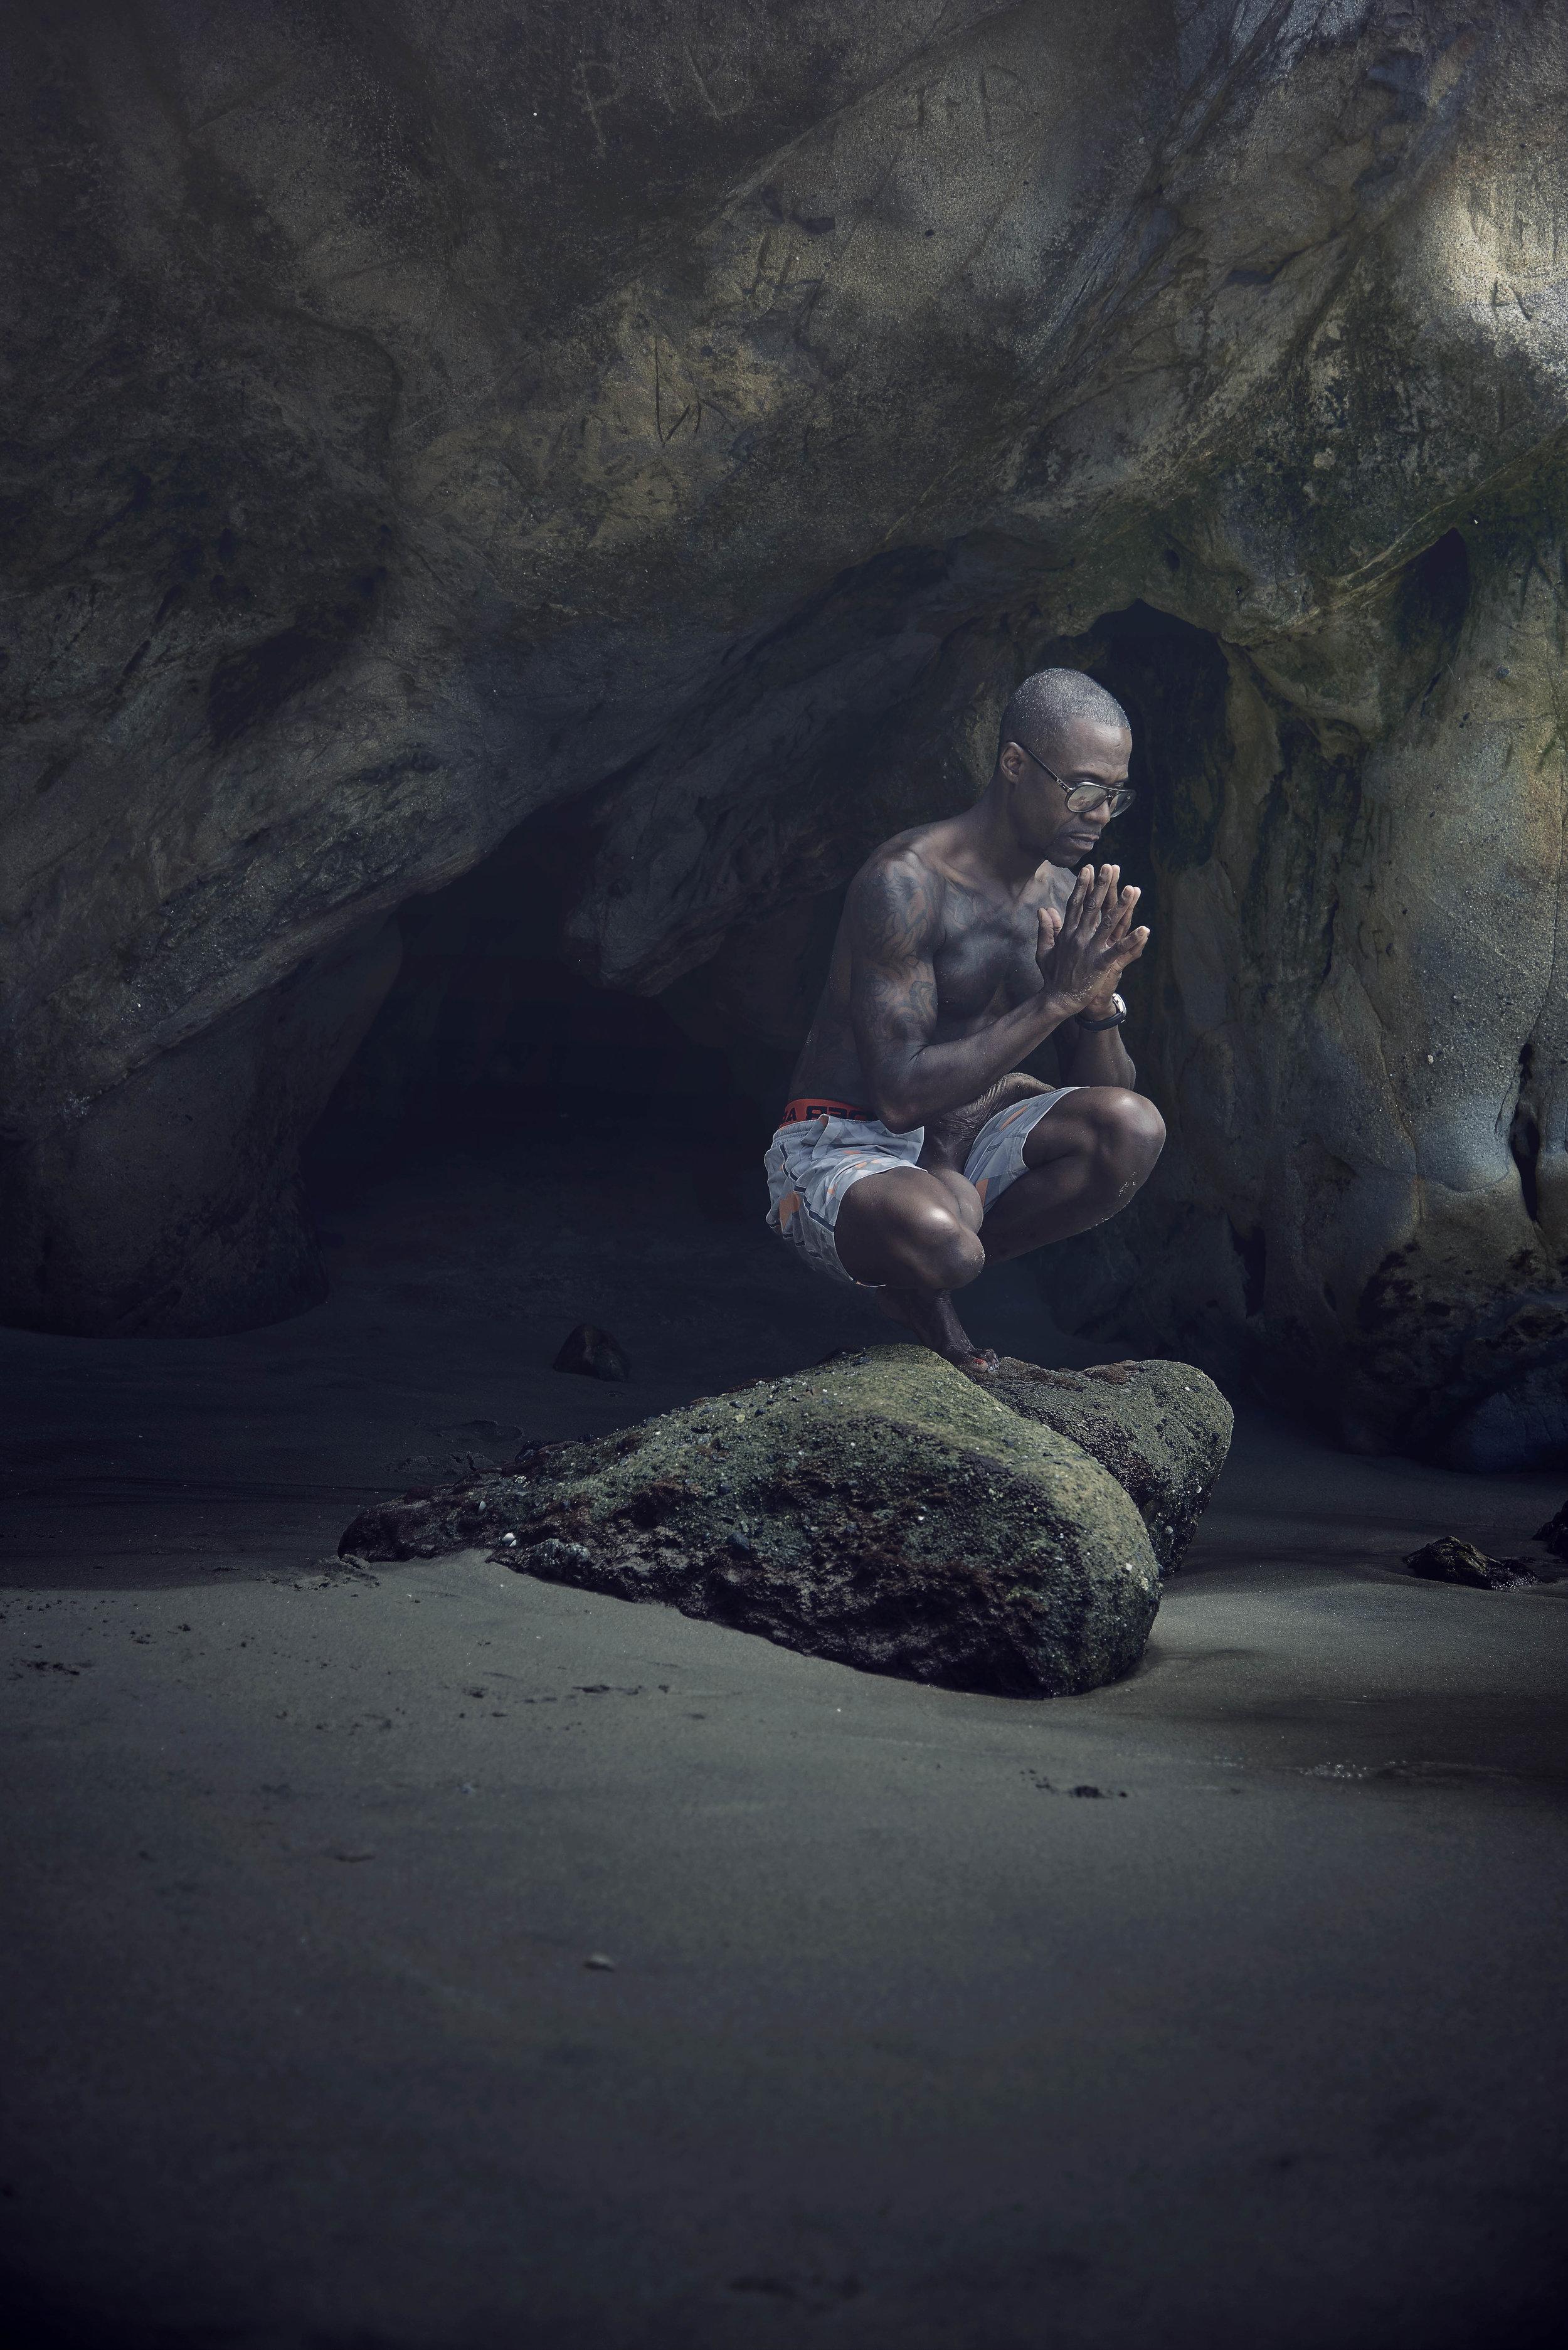 dray_meditation_beach1 copy.jpg